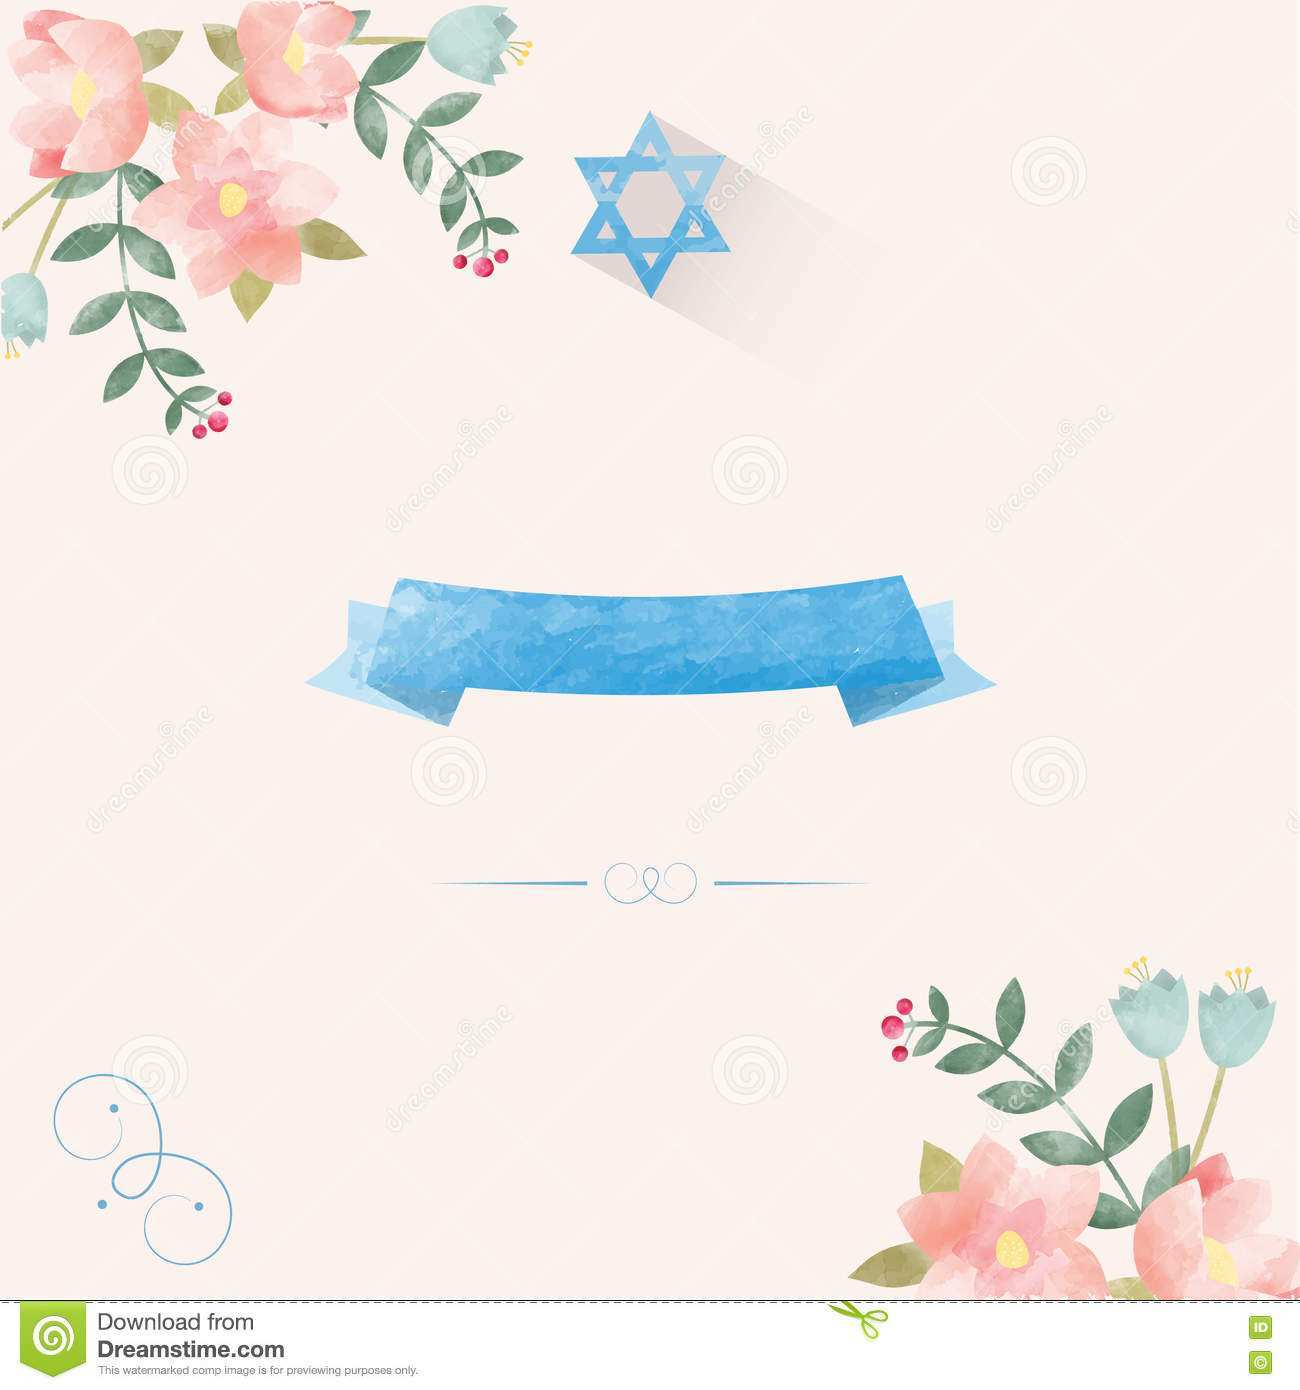 41 Creative Wedding Invitation Templates Jewish Templates with Wedding Invitation Templates Jewish